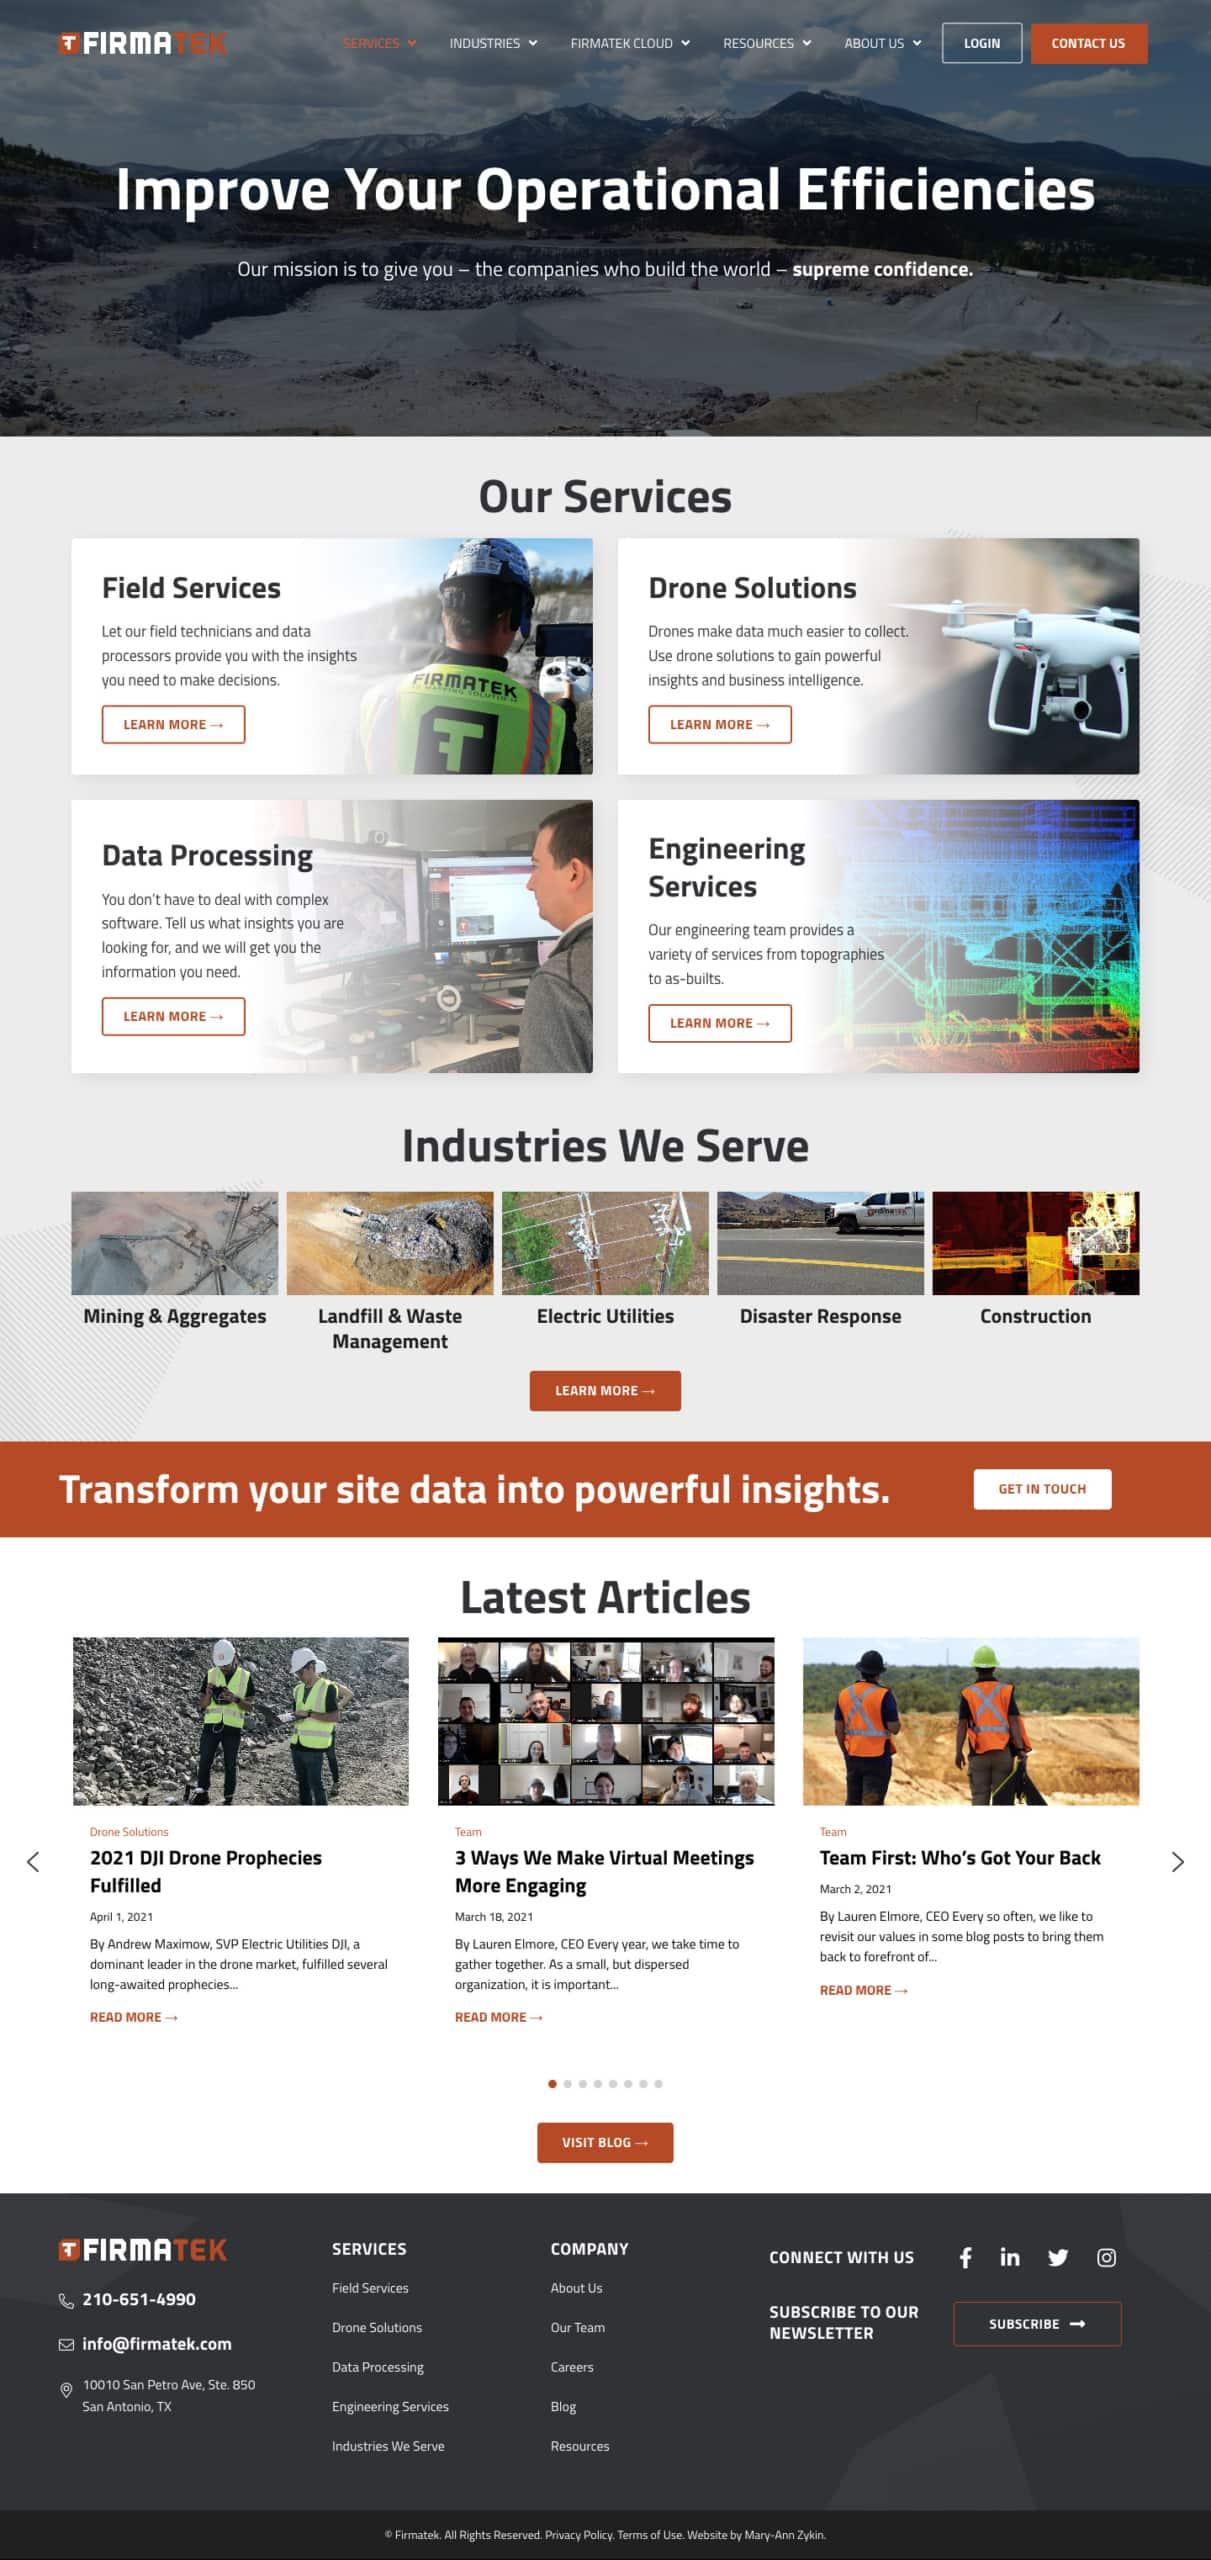 Firmatek Services Page